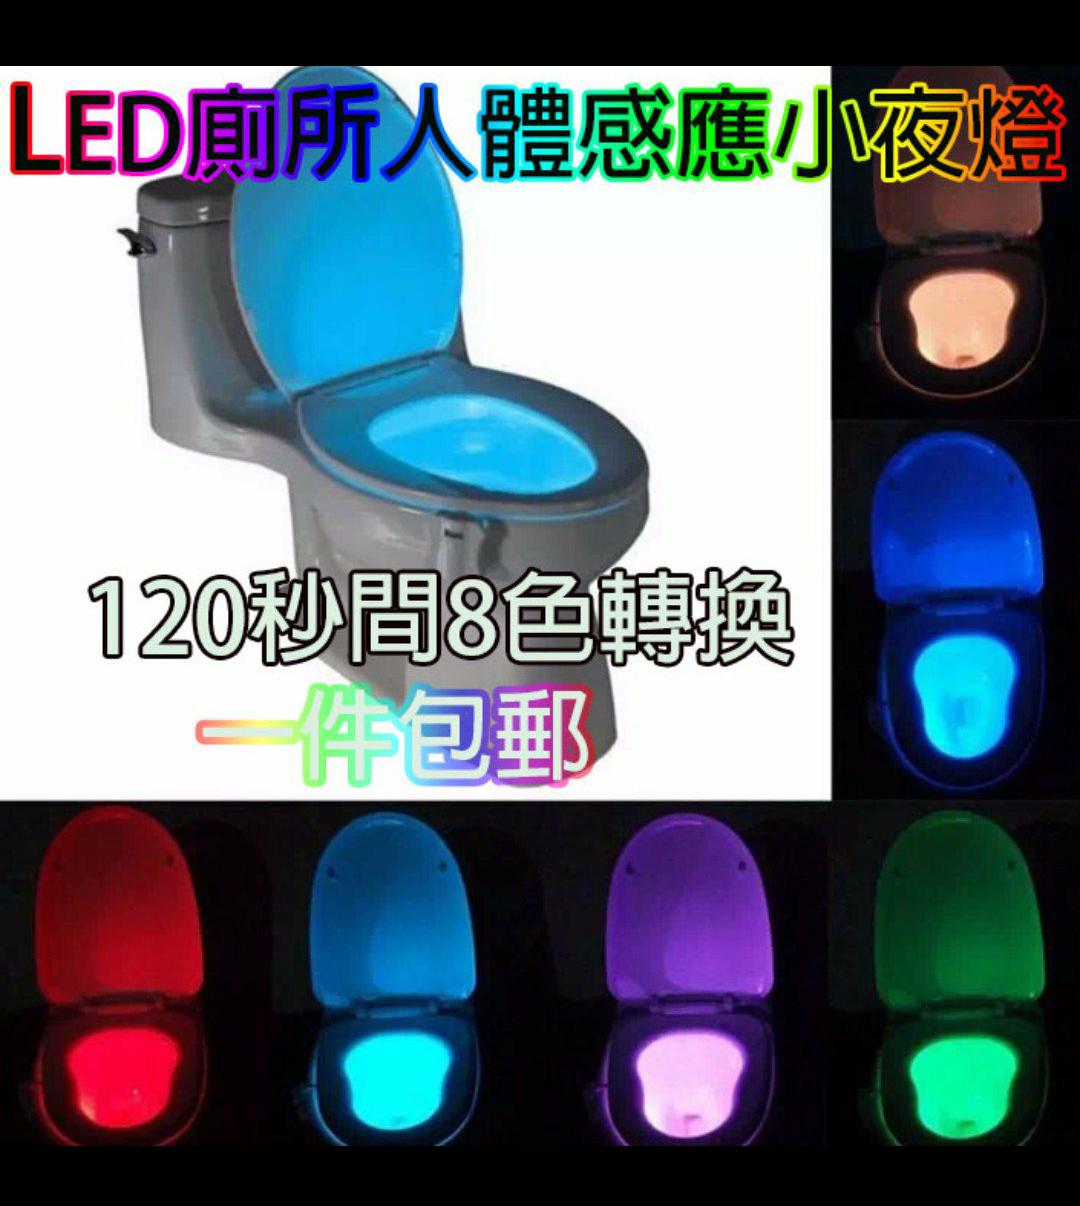 LED 廁所人體感應小夜燈